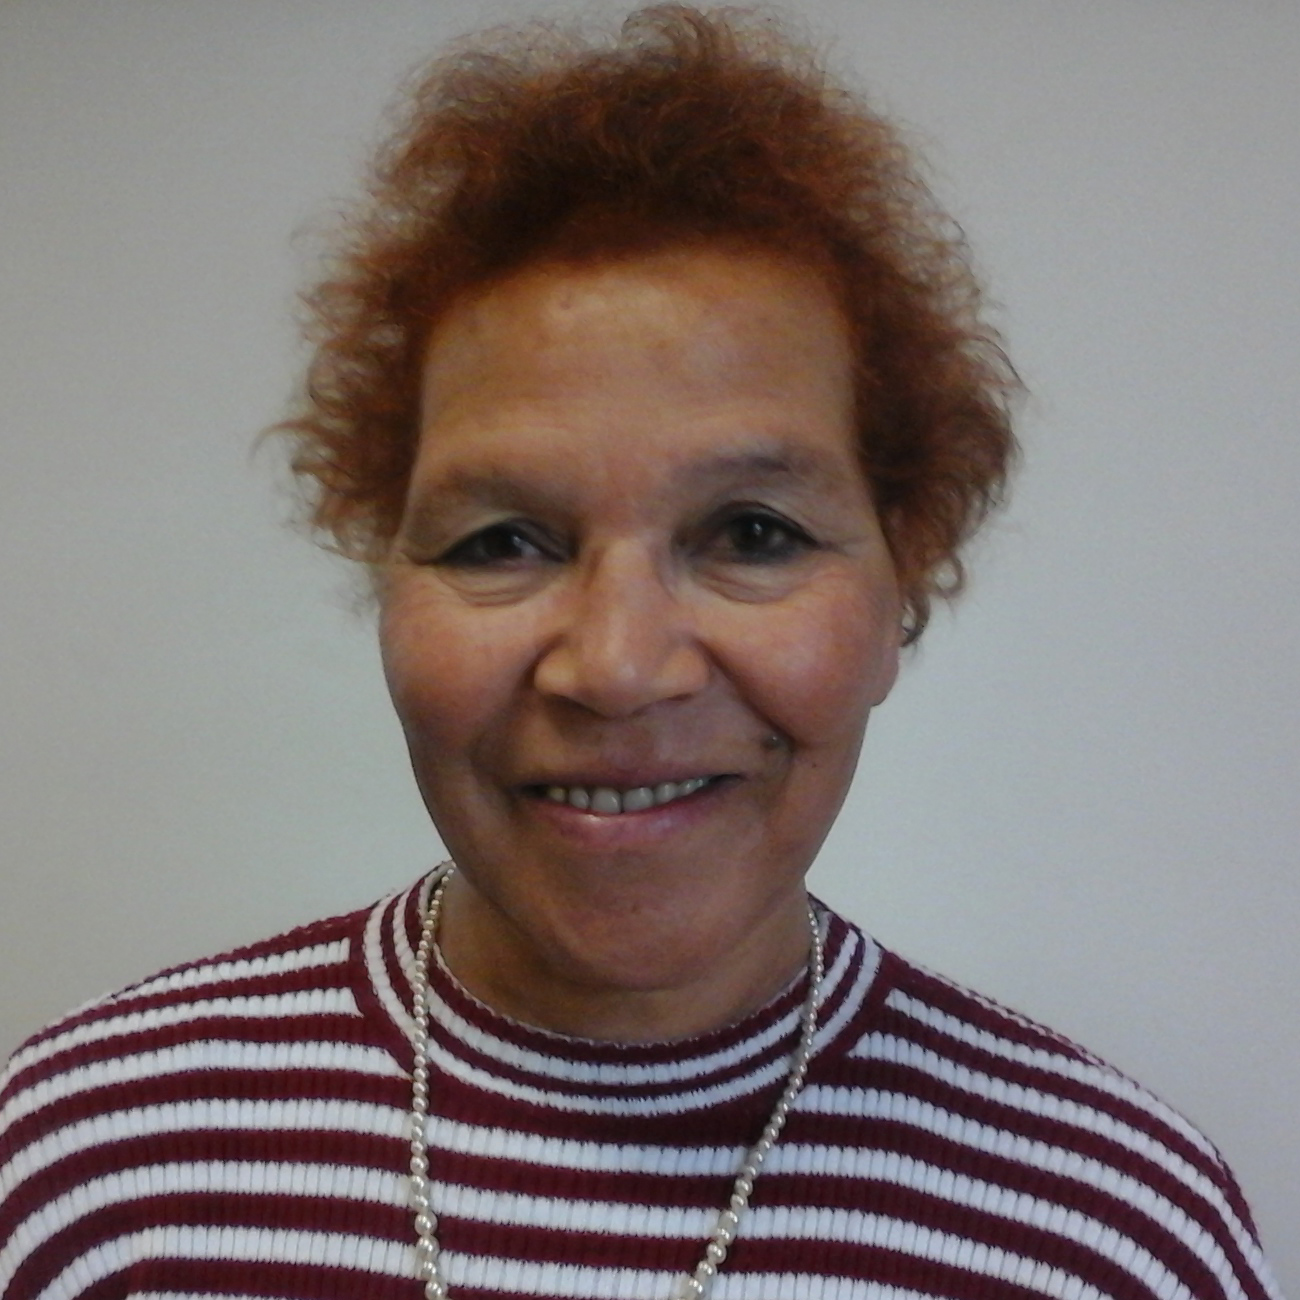 Mina Pégourié